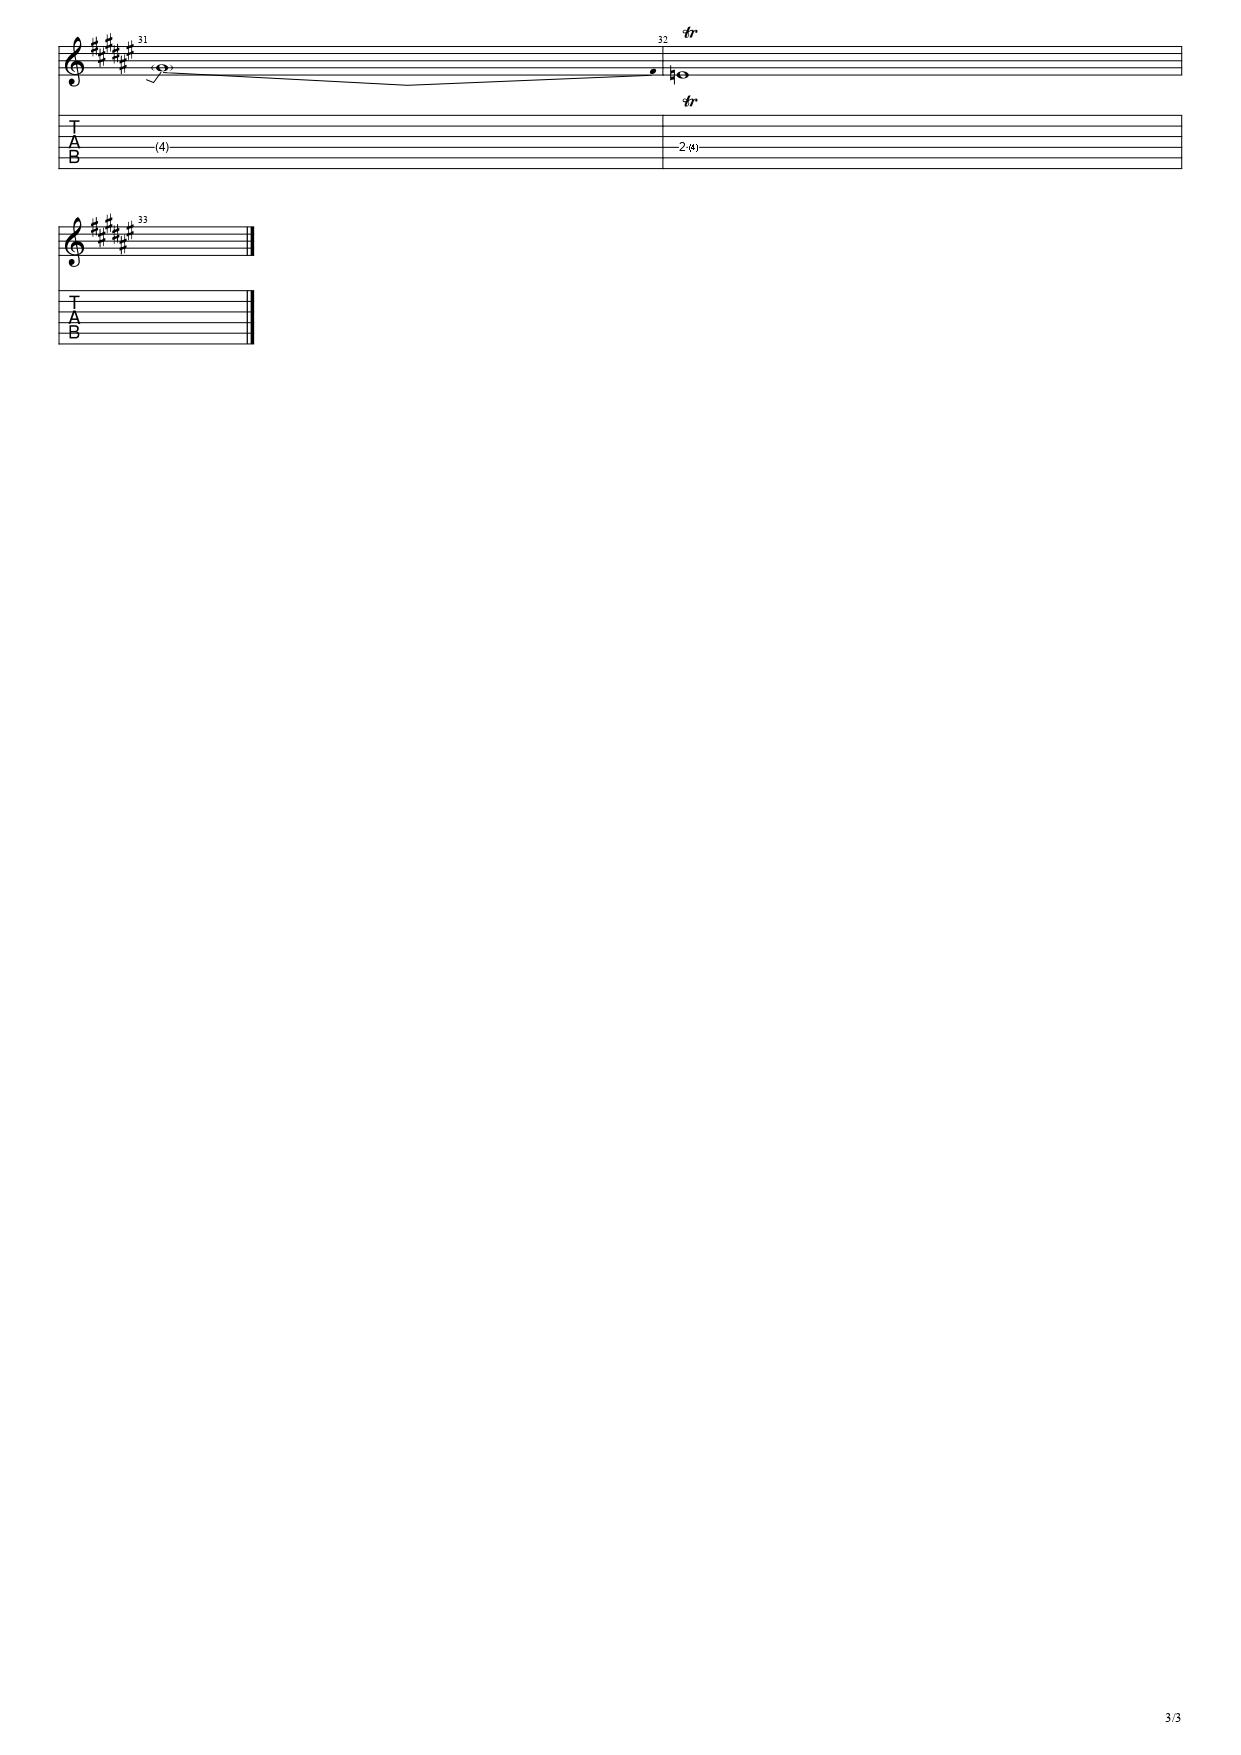 【TAB】Metropolis Part1 / Dream Theater Guitar Solo メトロポリス ドリームシアター ギターソロ 練習 John Petrucci Lesson【Picking】